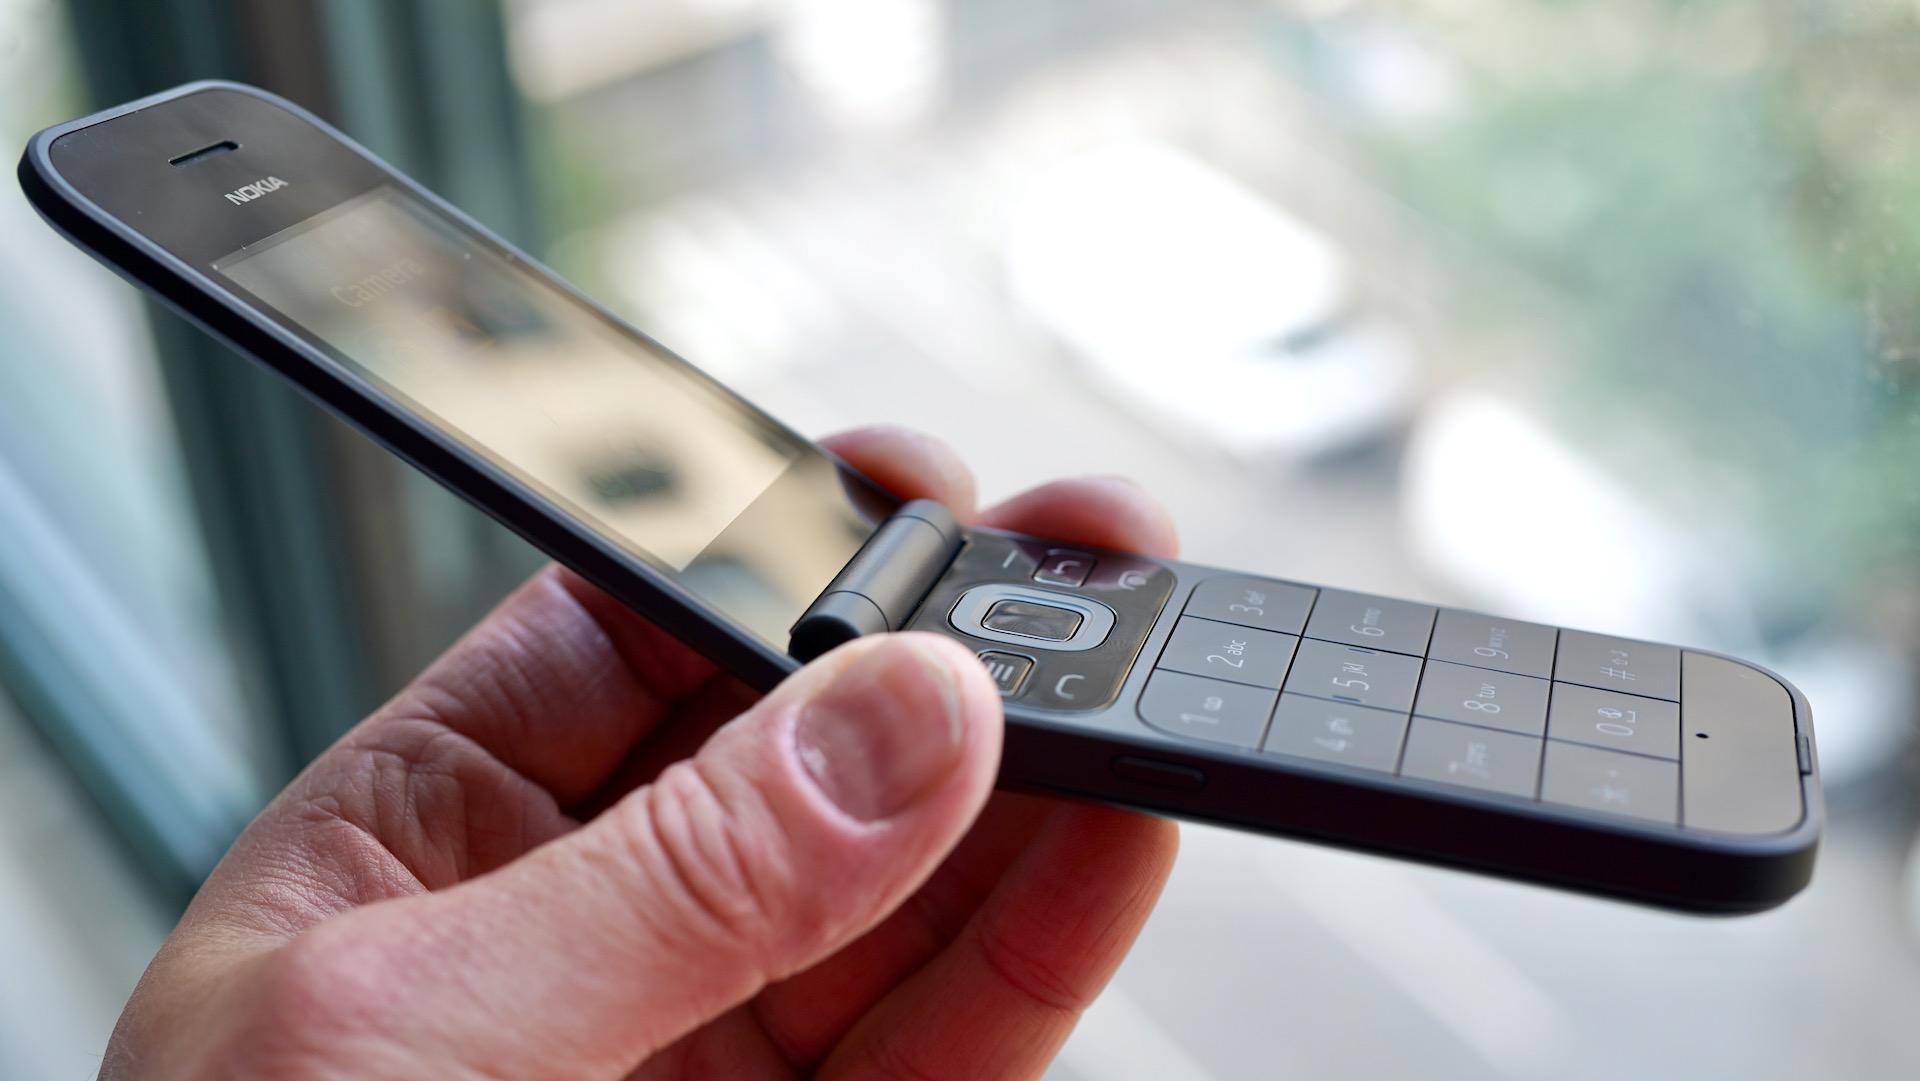 Nokia 2720 profile in hand